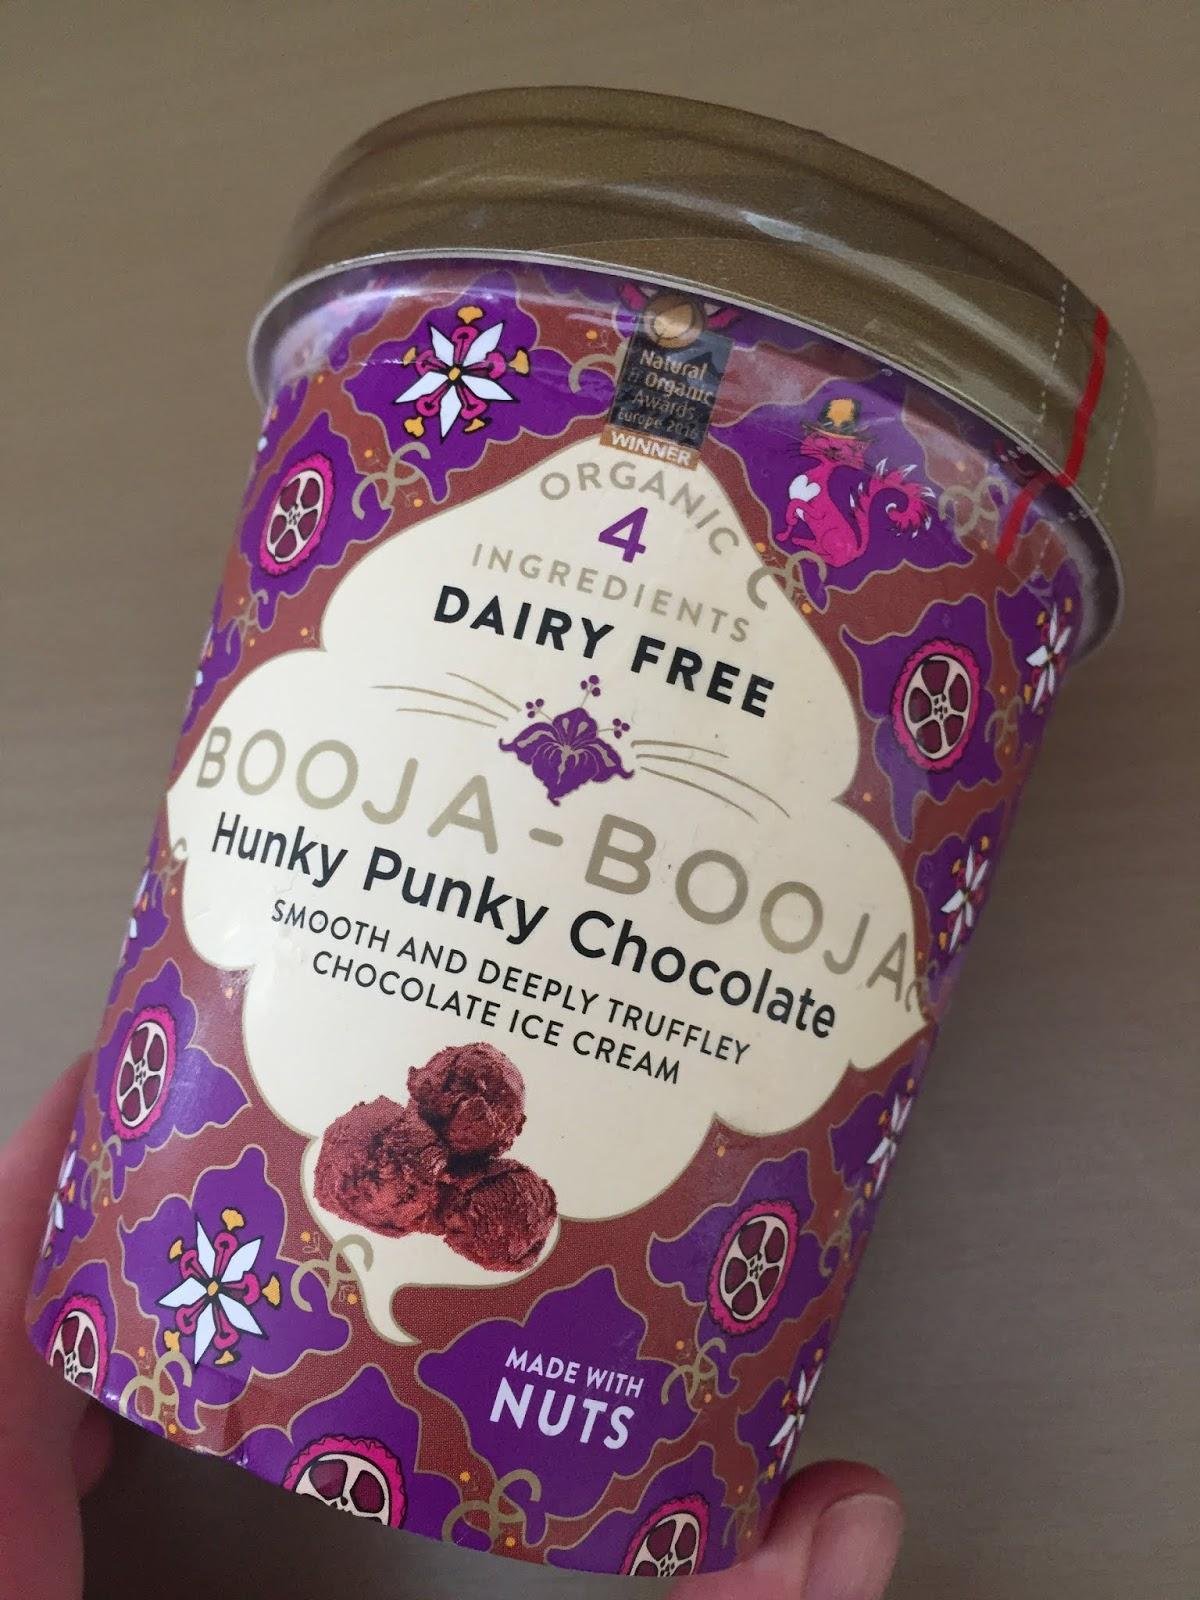 Booja Booja Hunky Punky Chocolate Ice Cream